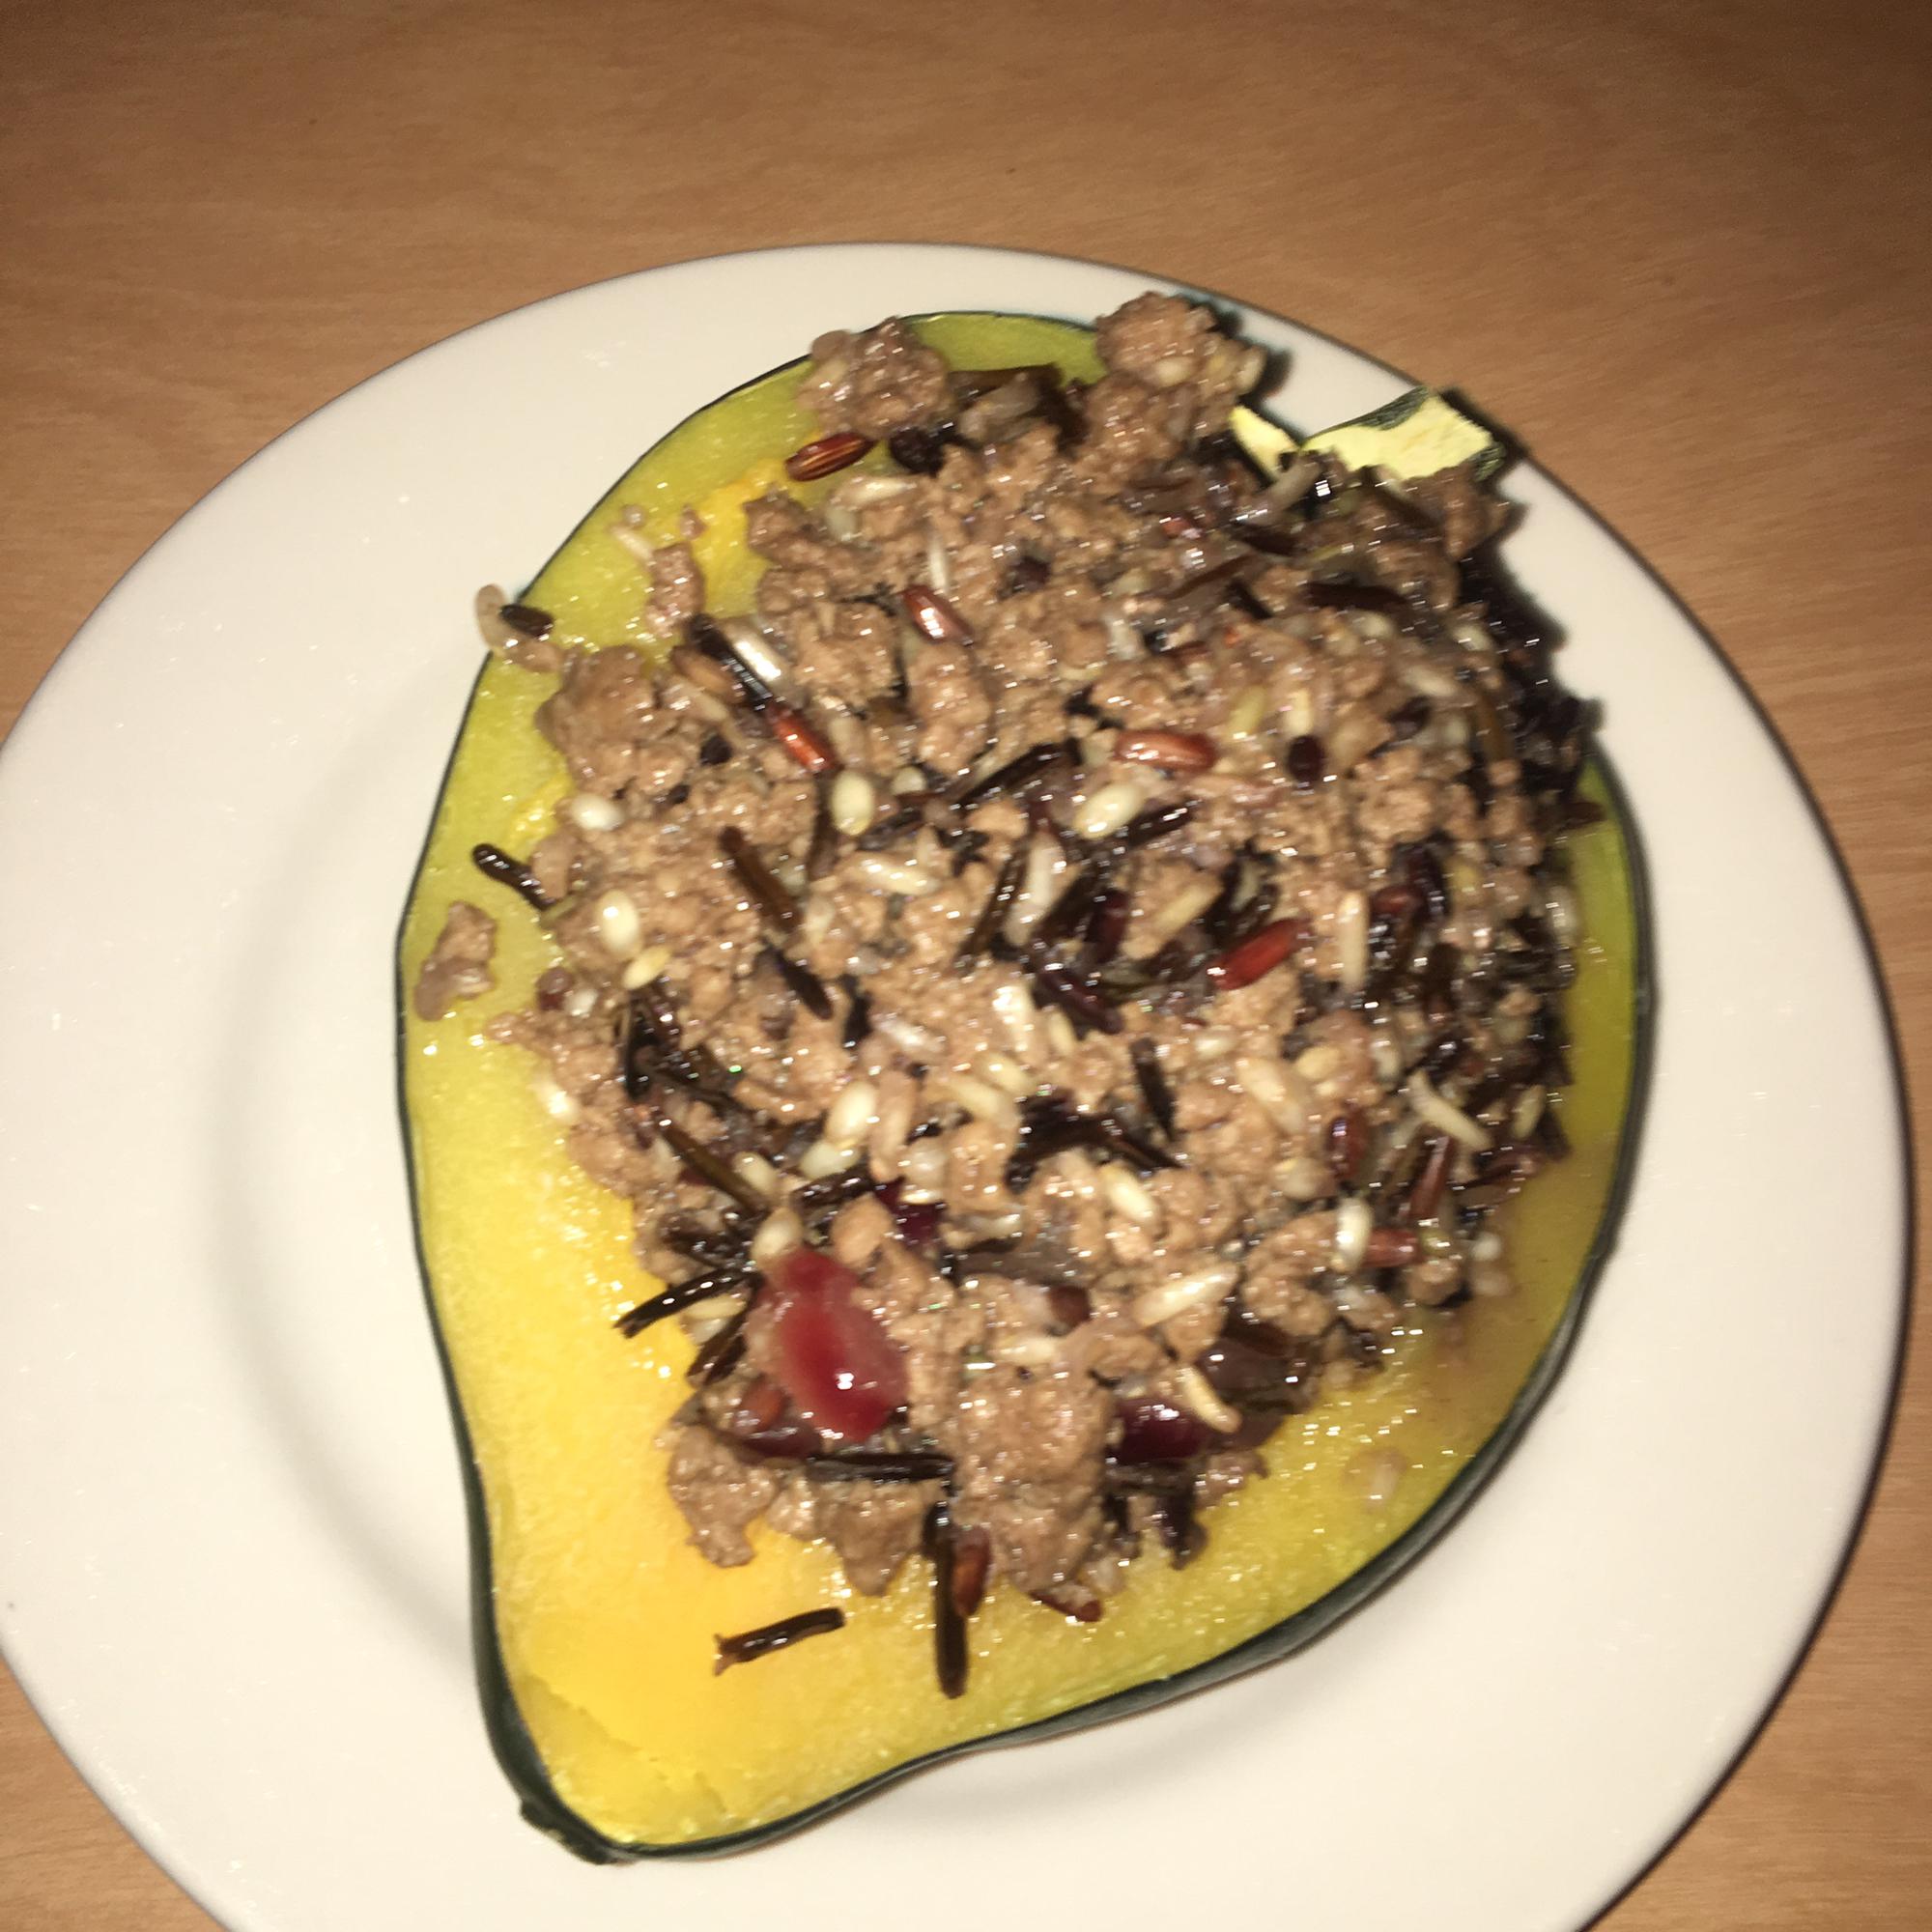 Venison and Wild Rice Stuffed Acorn Squash TaterTotsMom